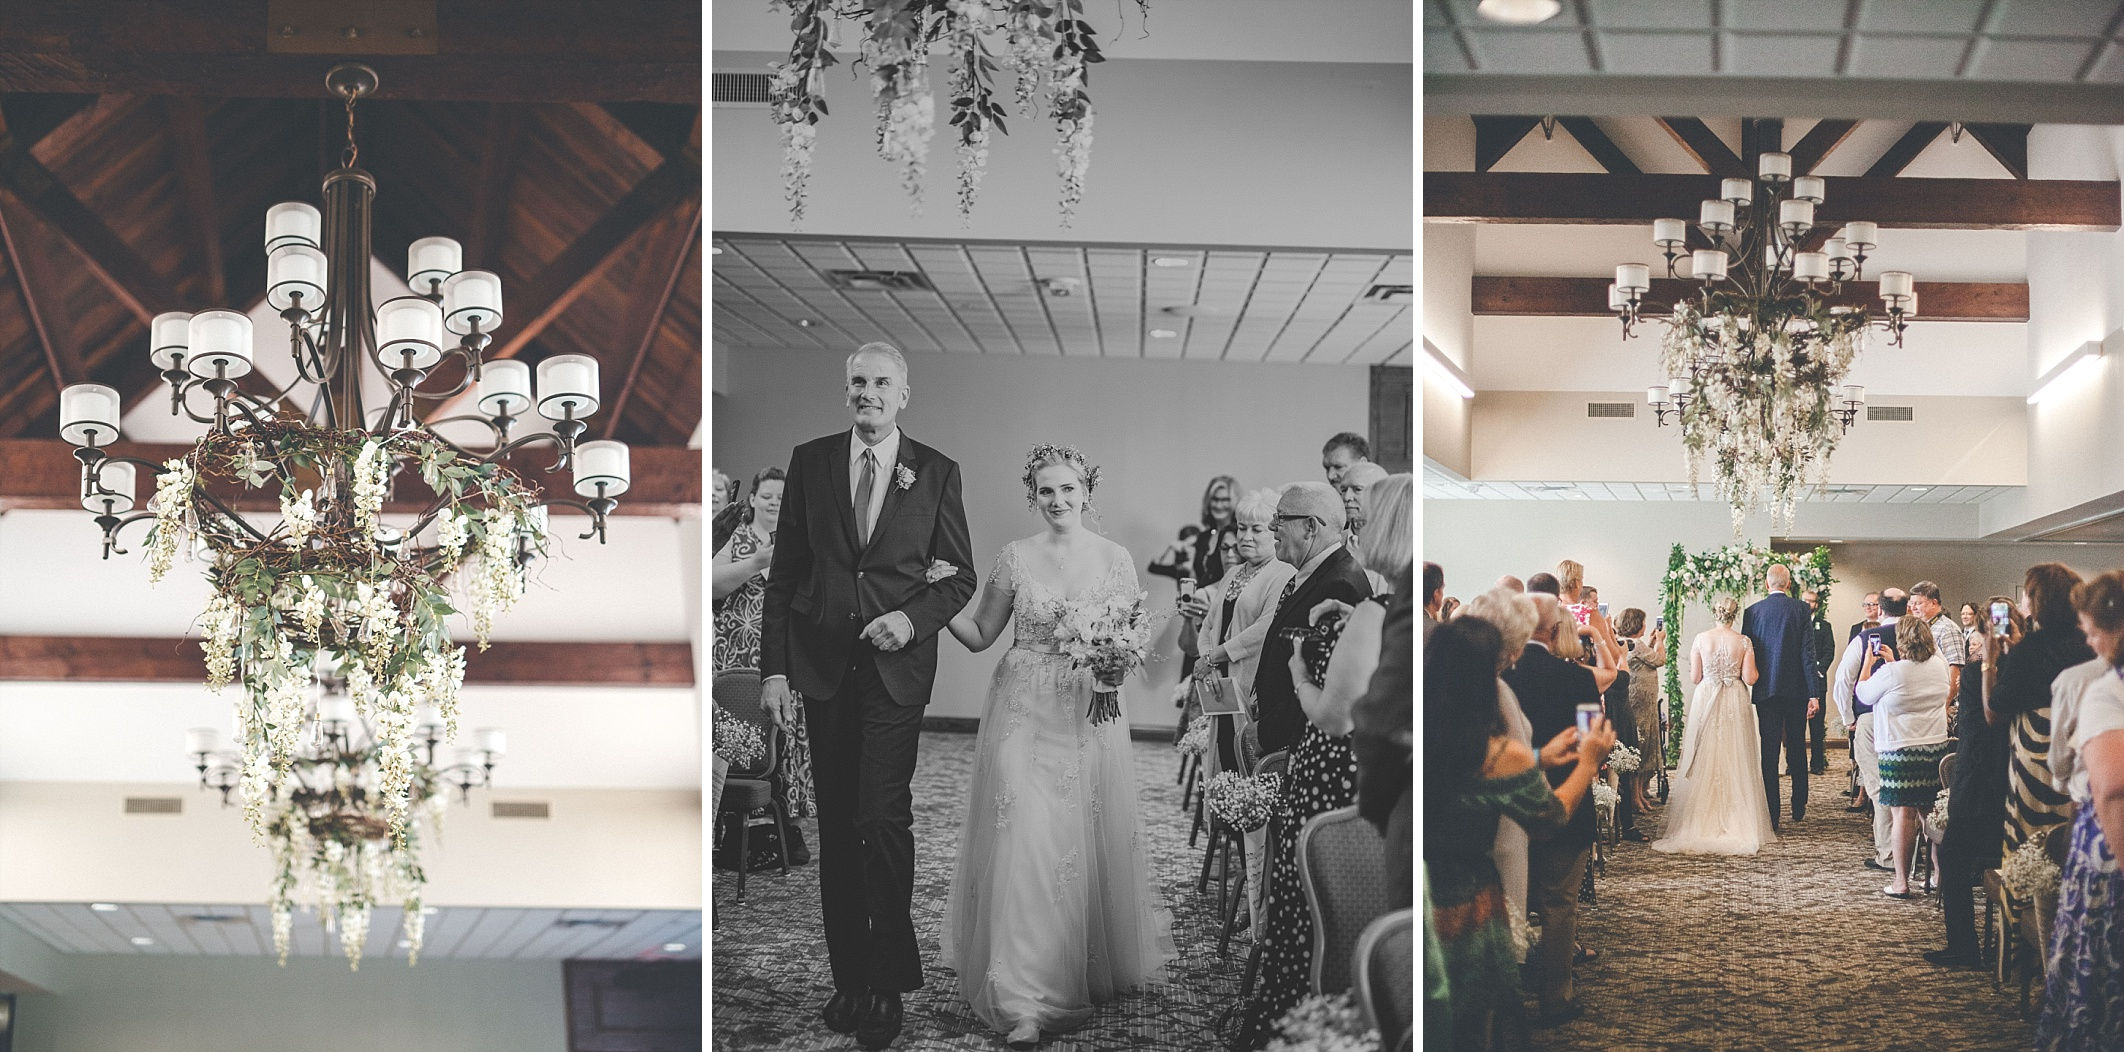 wedding-photographer-dayton-ohio_0090.jpg